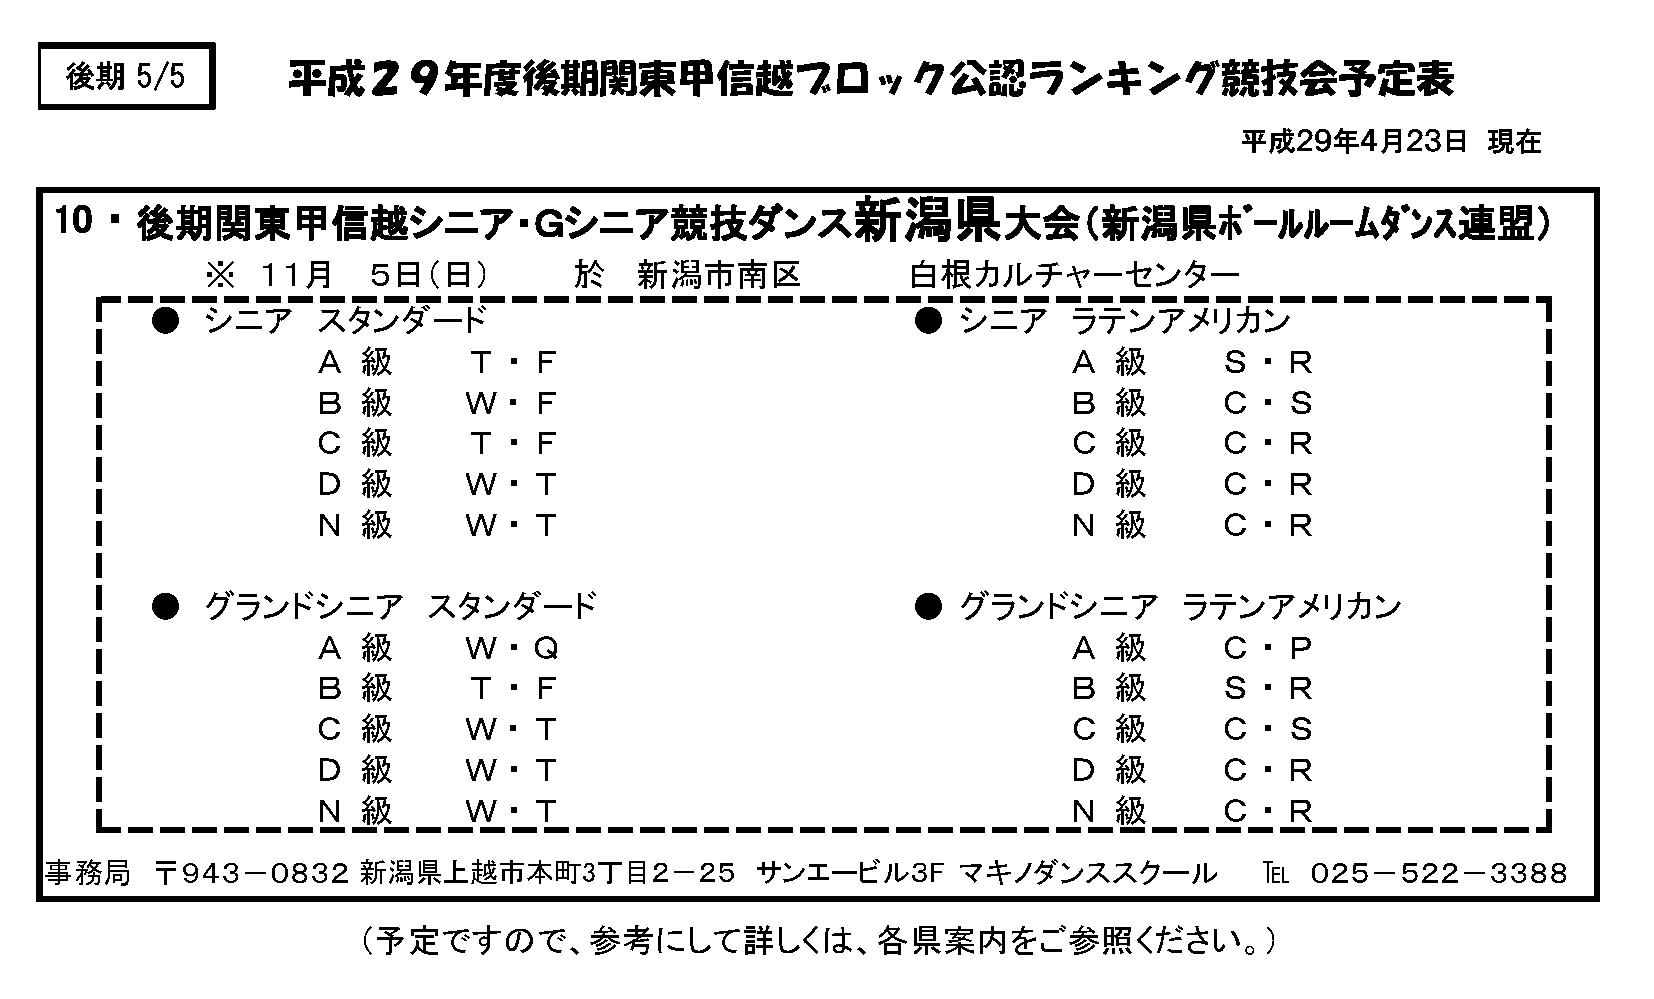 schedule_latter_5_5-min